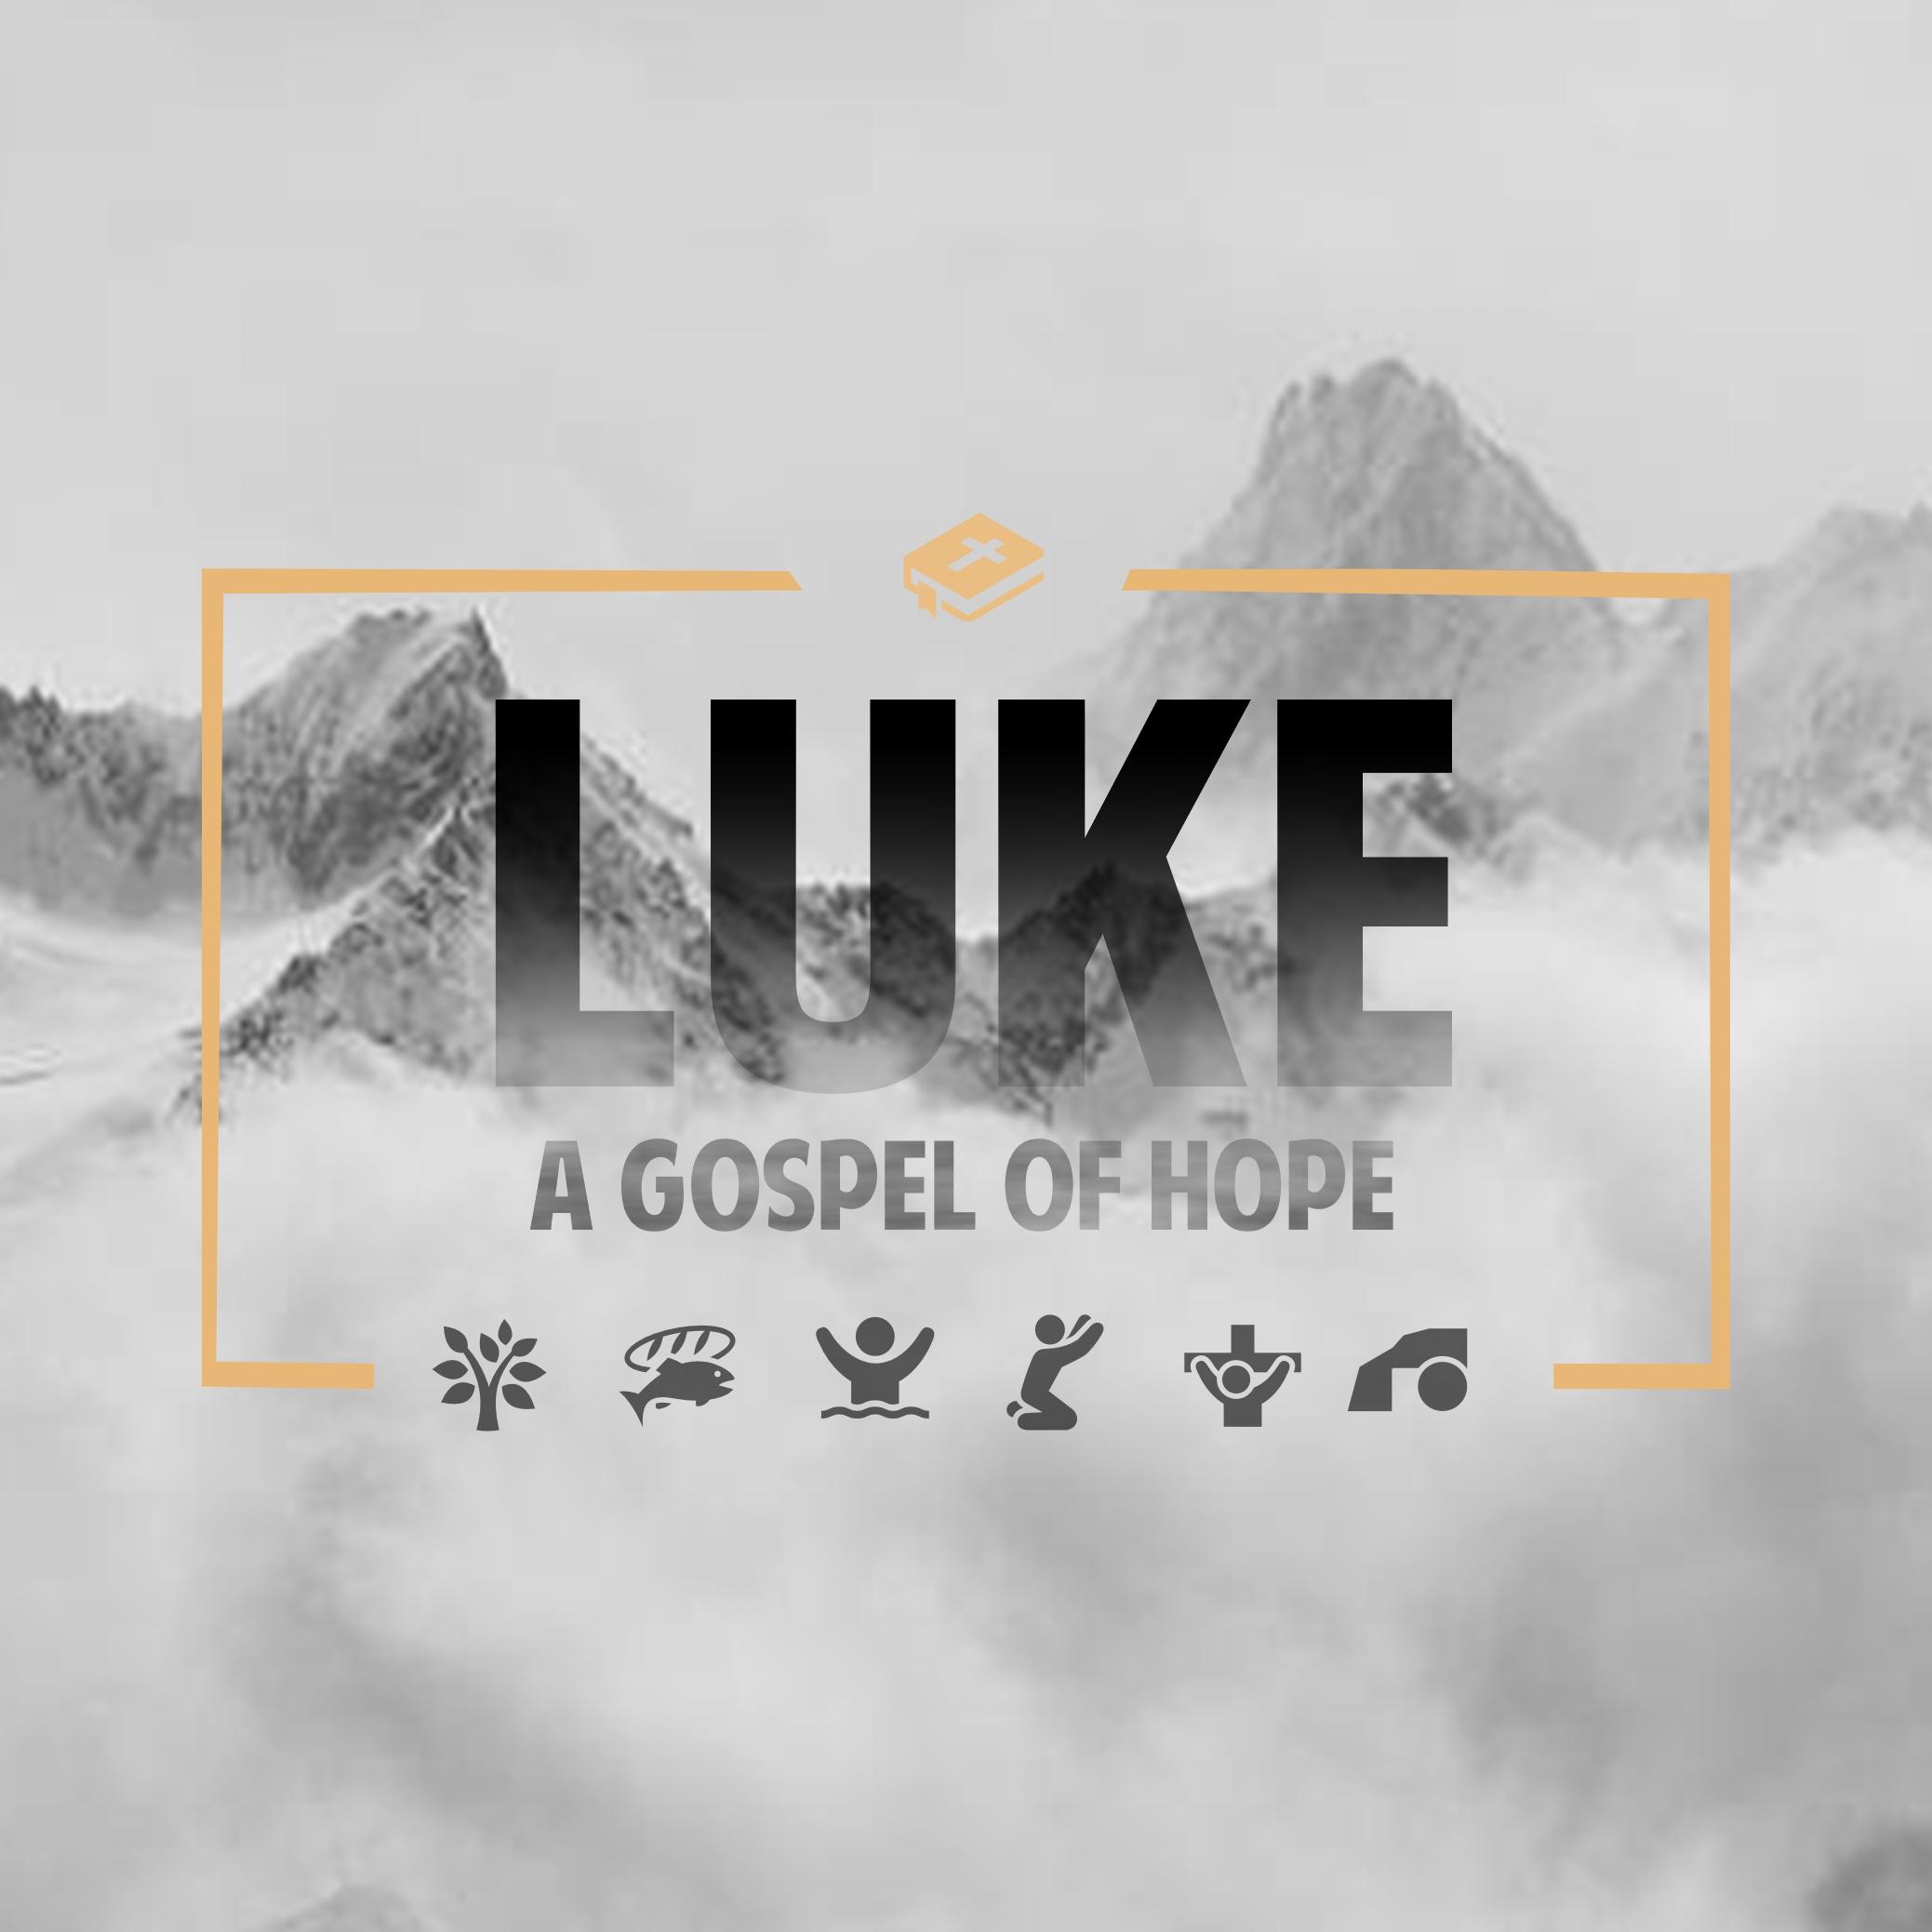 Luke Square